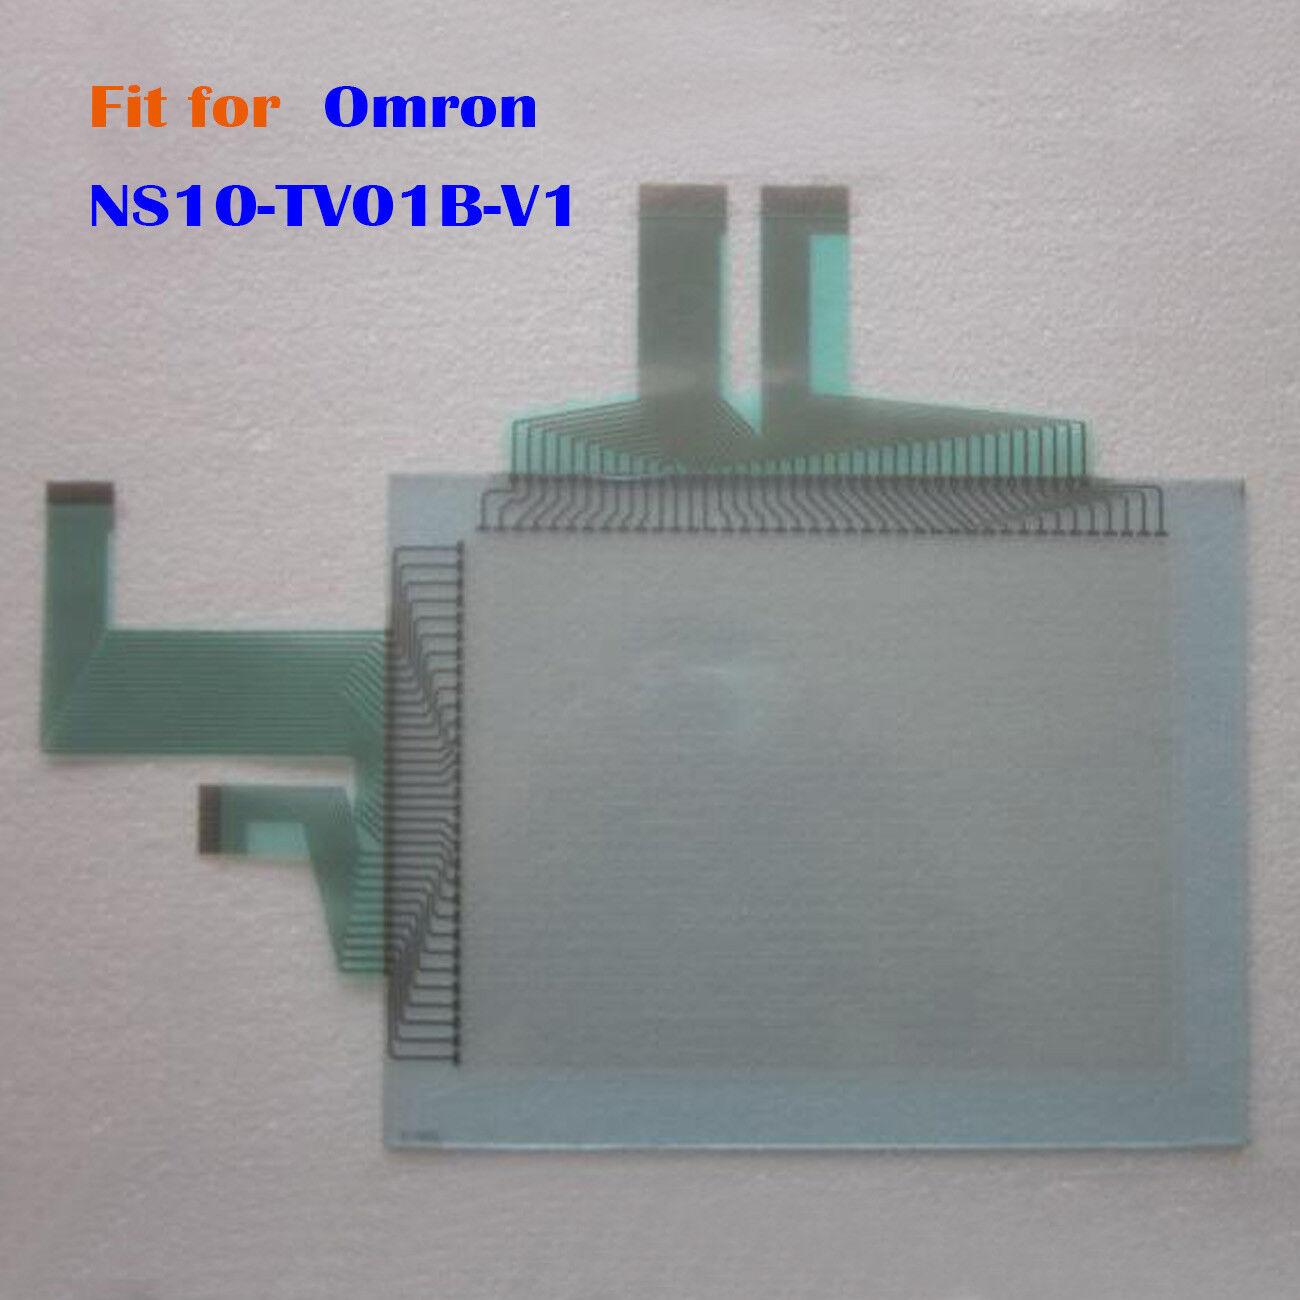 New Touch Panel Glass for Omron NS10-TV01B-V1, NS10-TV01B-V1